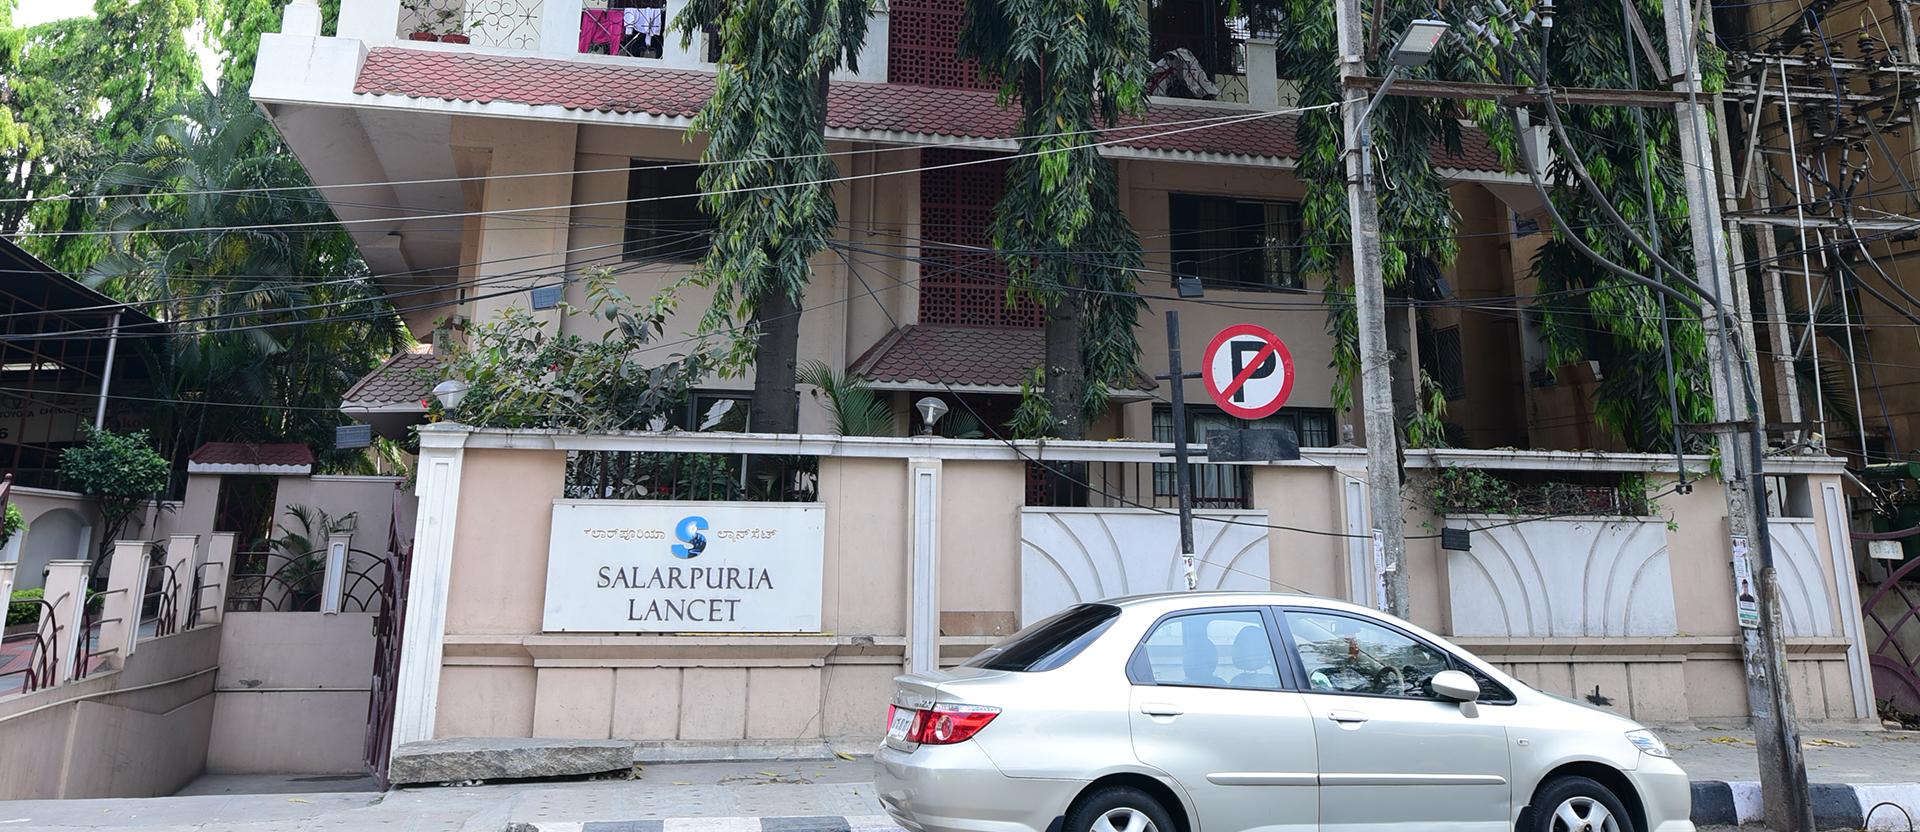 Salarpuria Sattva Lancet, Bangalore - Salarpuria Sattva Lancet